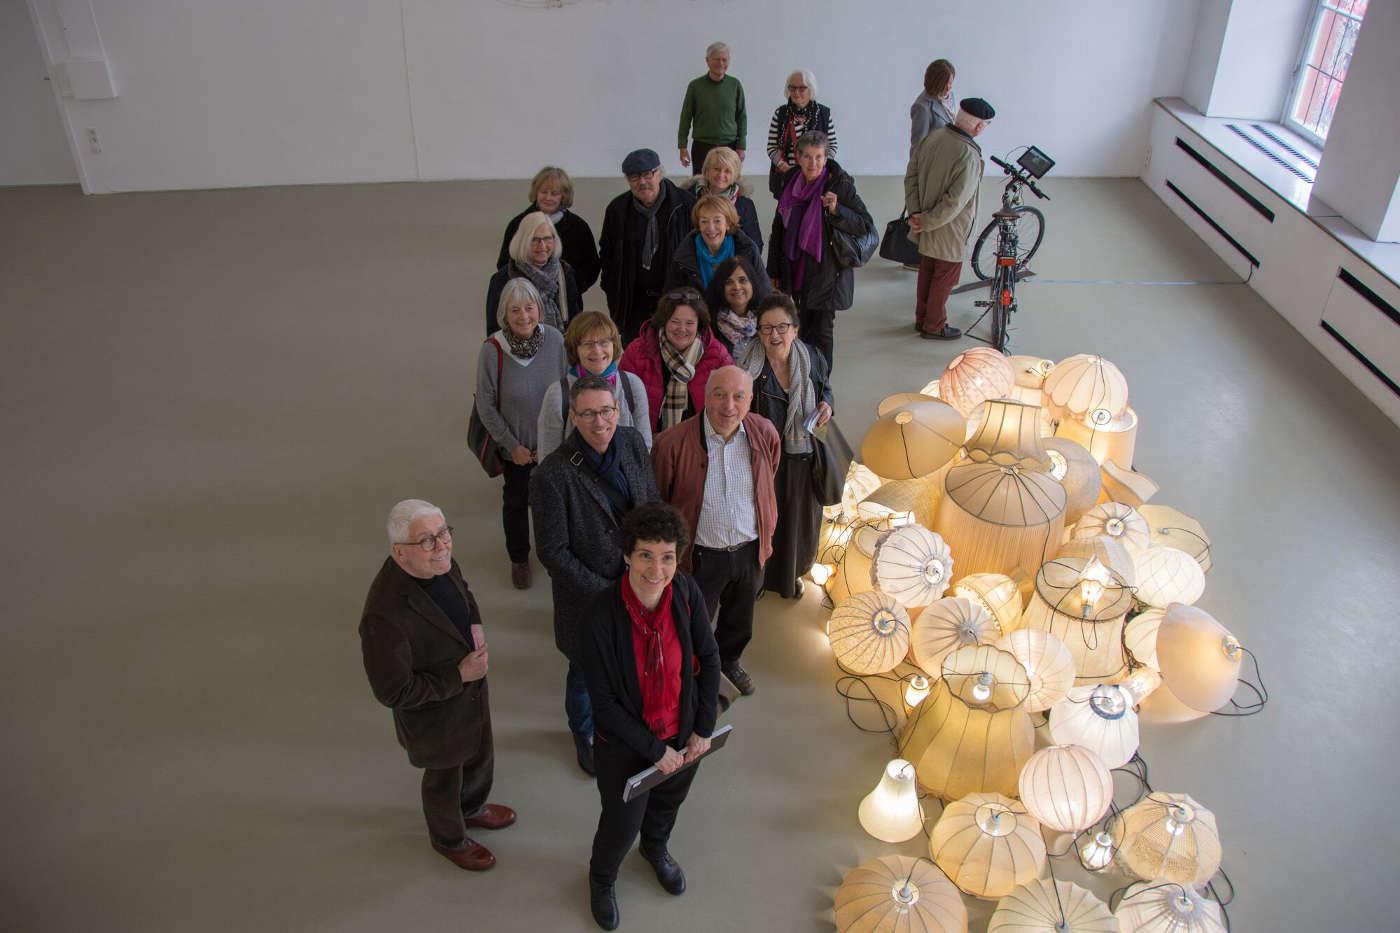 Kunstausfahrt nach Rottweil am 21. März 2018